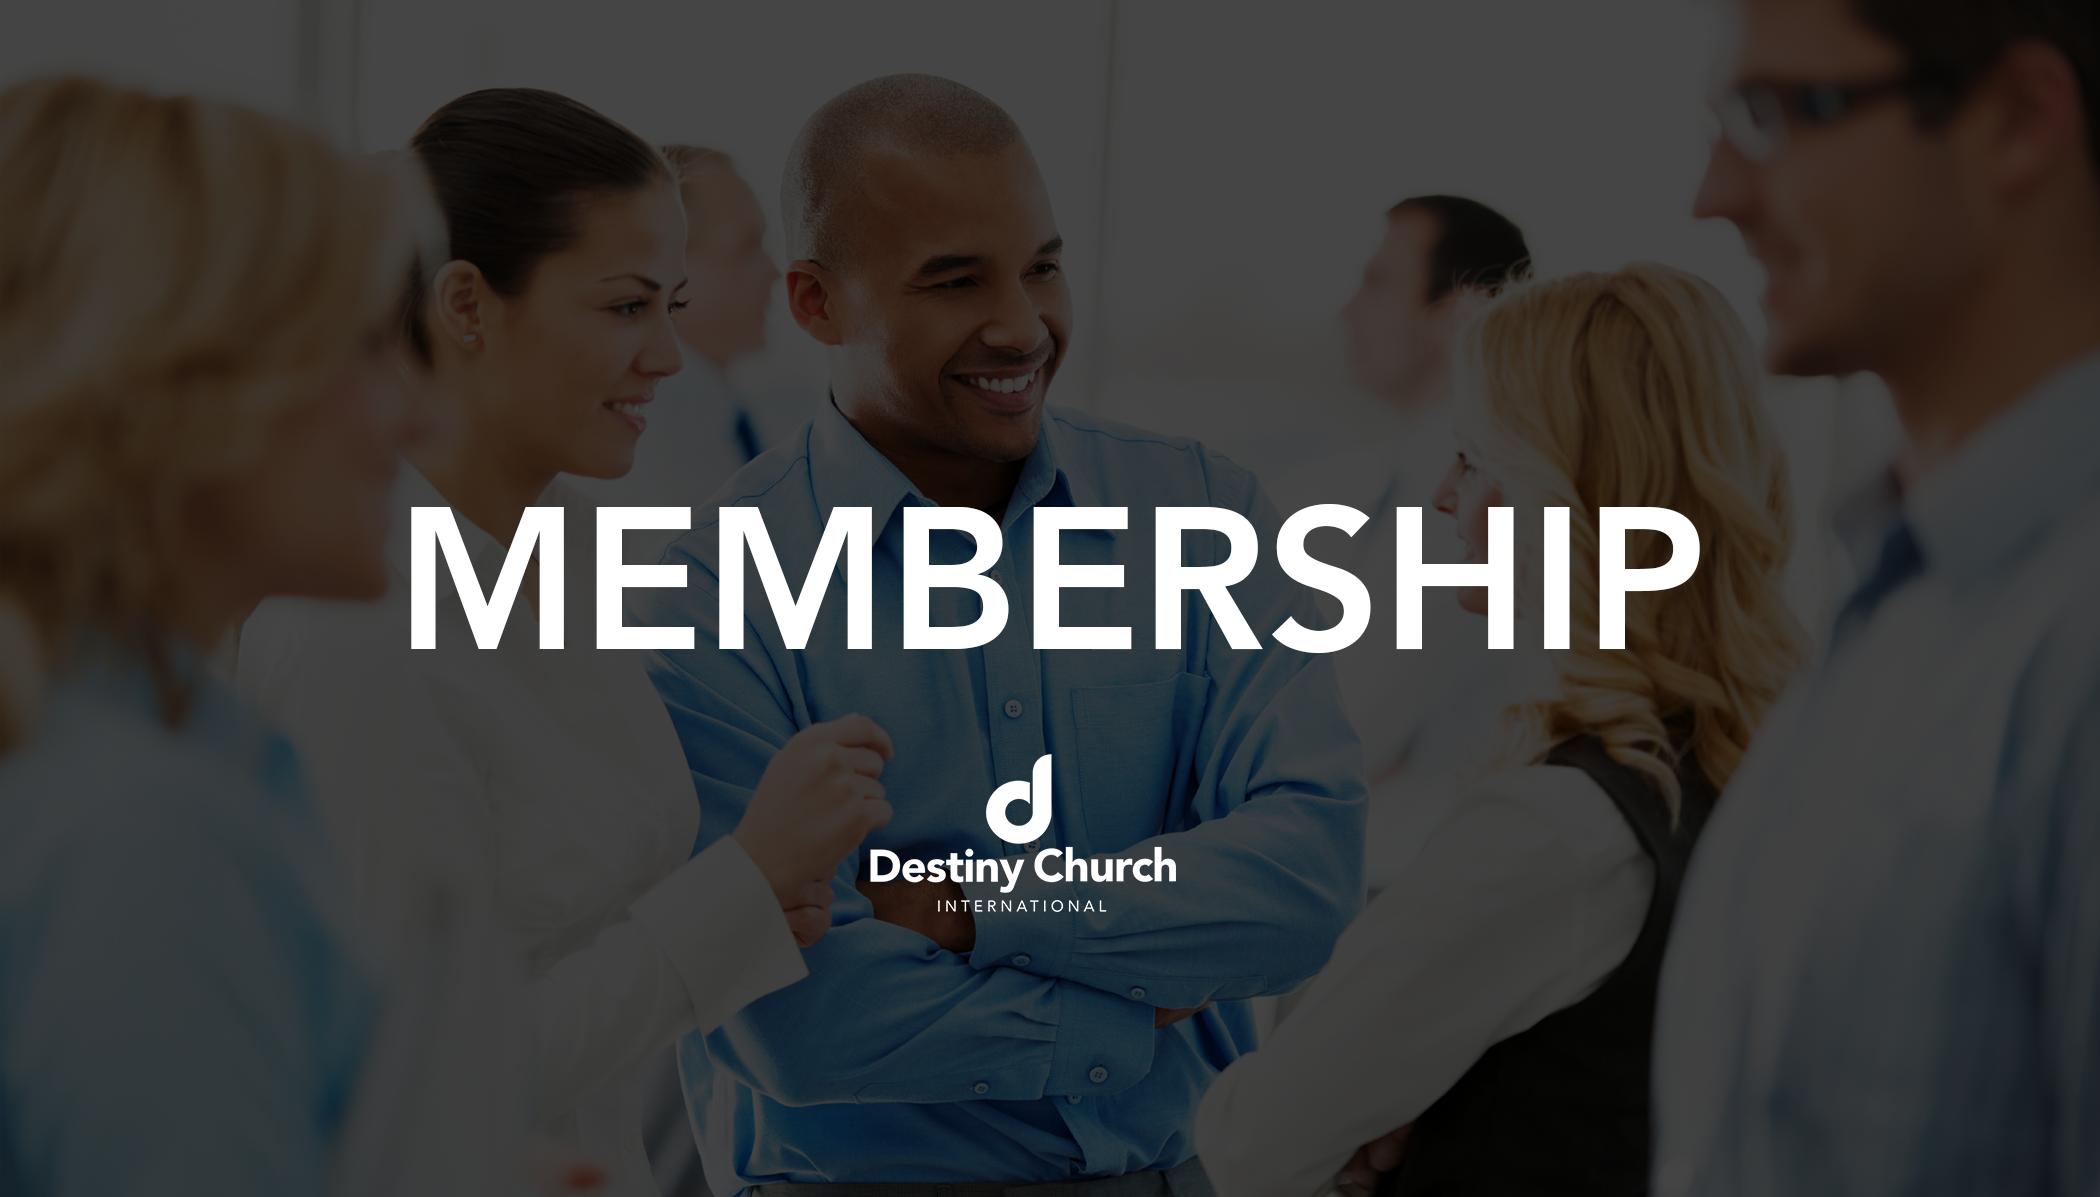 Membership title